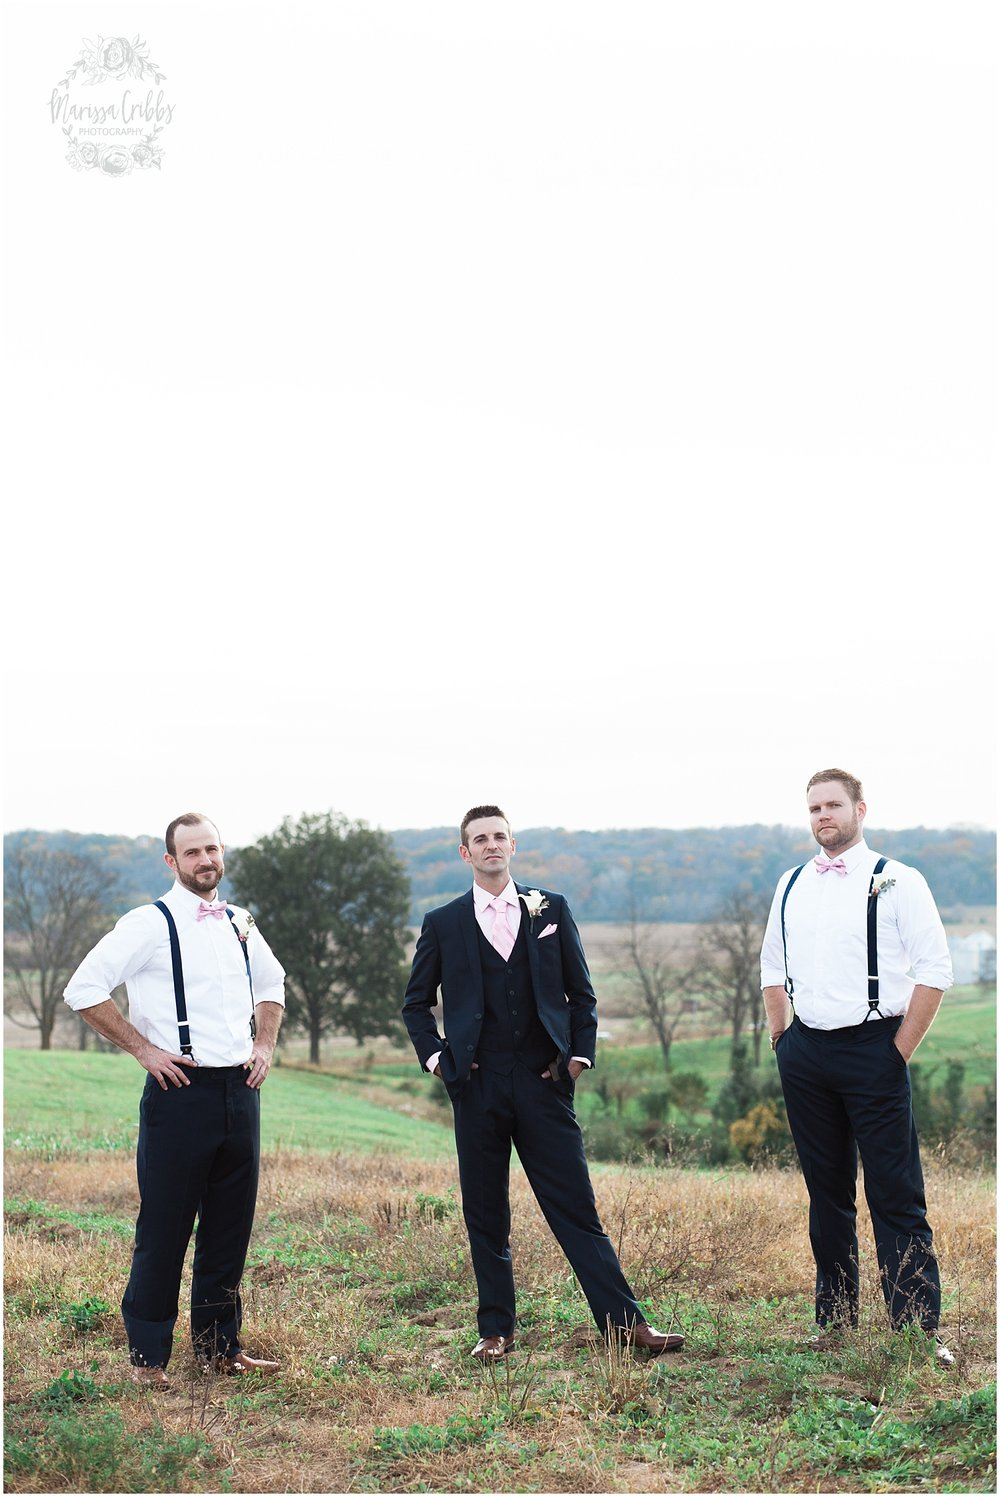 Alex & Amie | Eighteen Ninety Event Space | Marissa Cribbs Photography | Kansas City Perfect Wedding Guide_1308.jpg